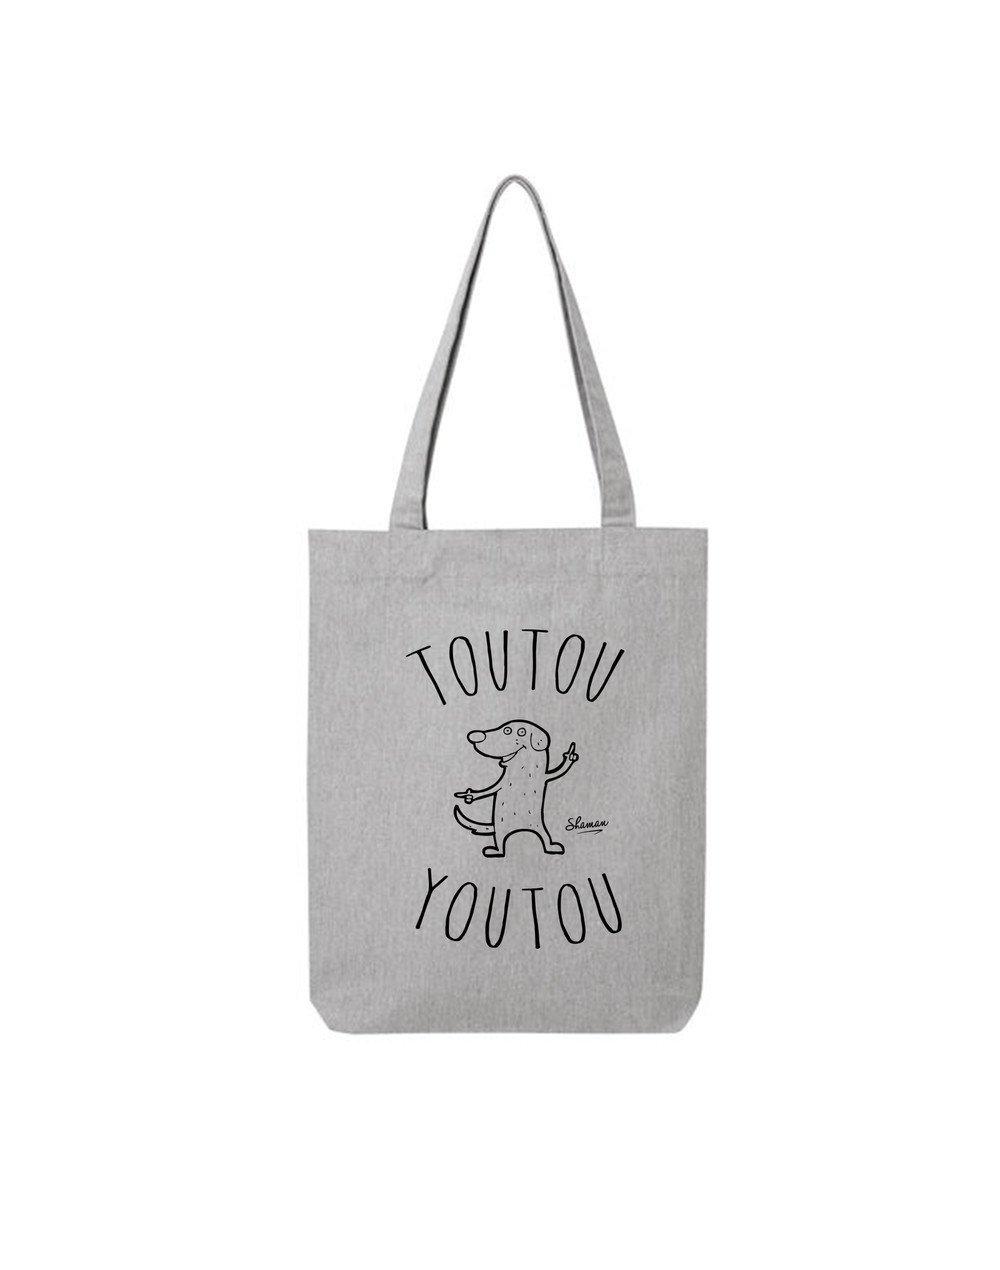 "Tote Bag ""Toutou Youtou"""